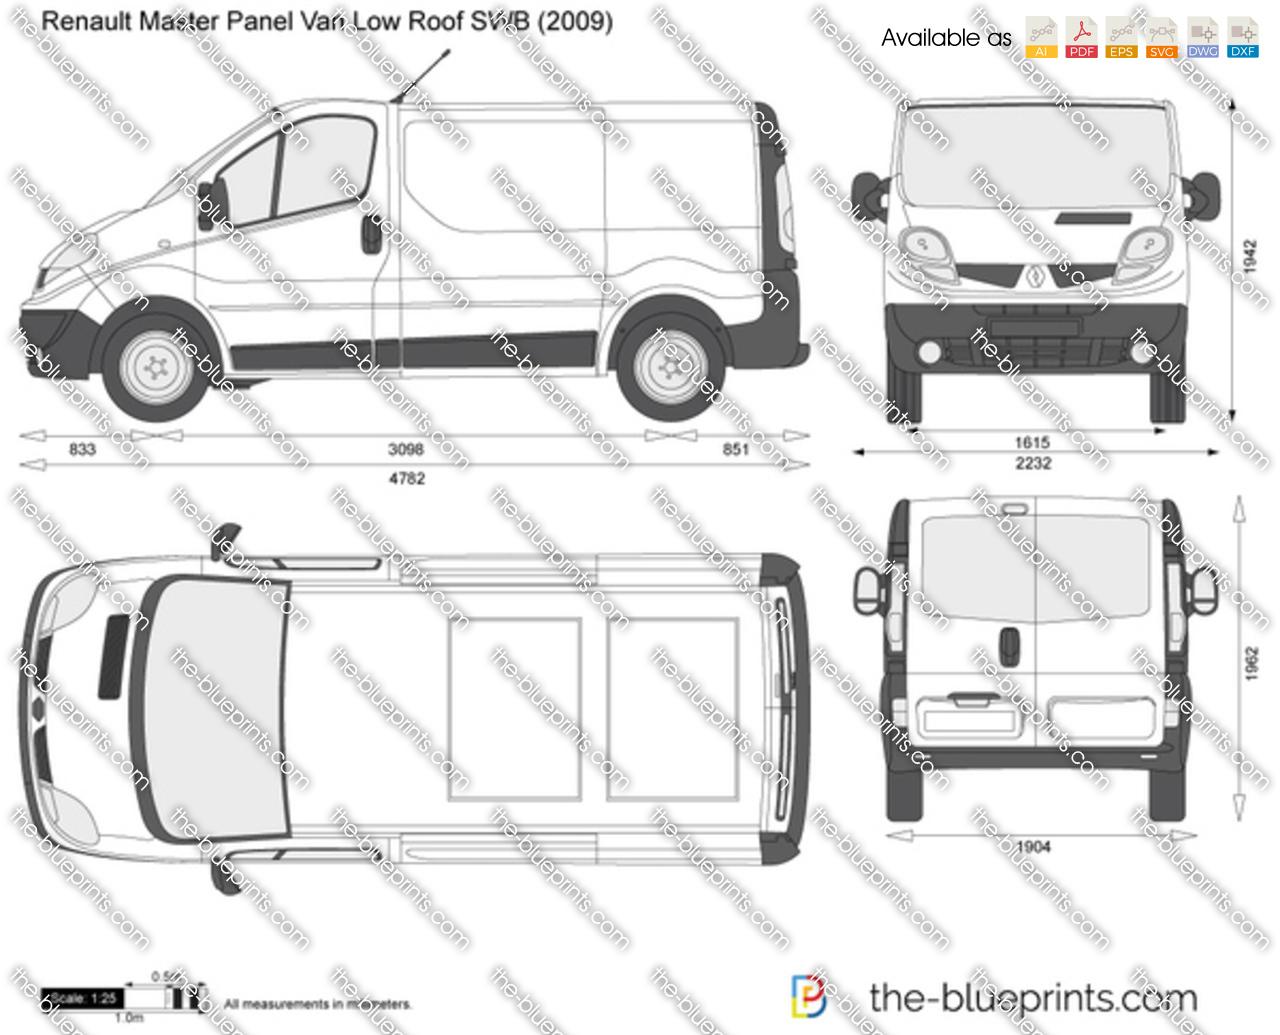 Renault Trafic Panel Van Low Roof SWB vector drawing